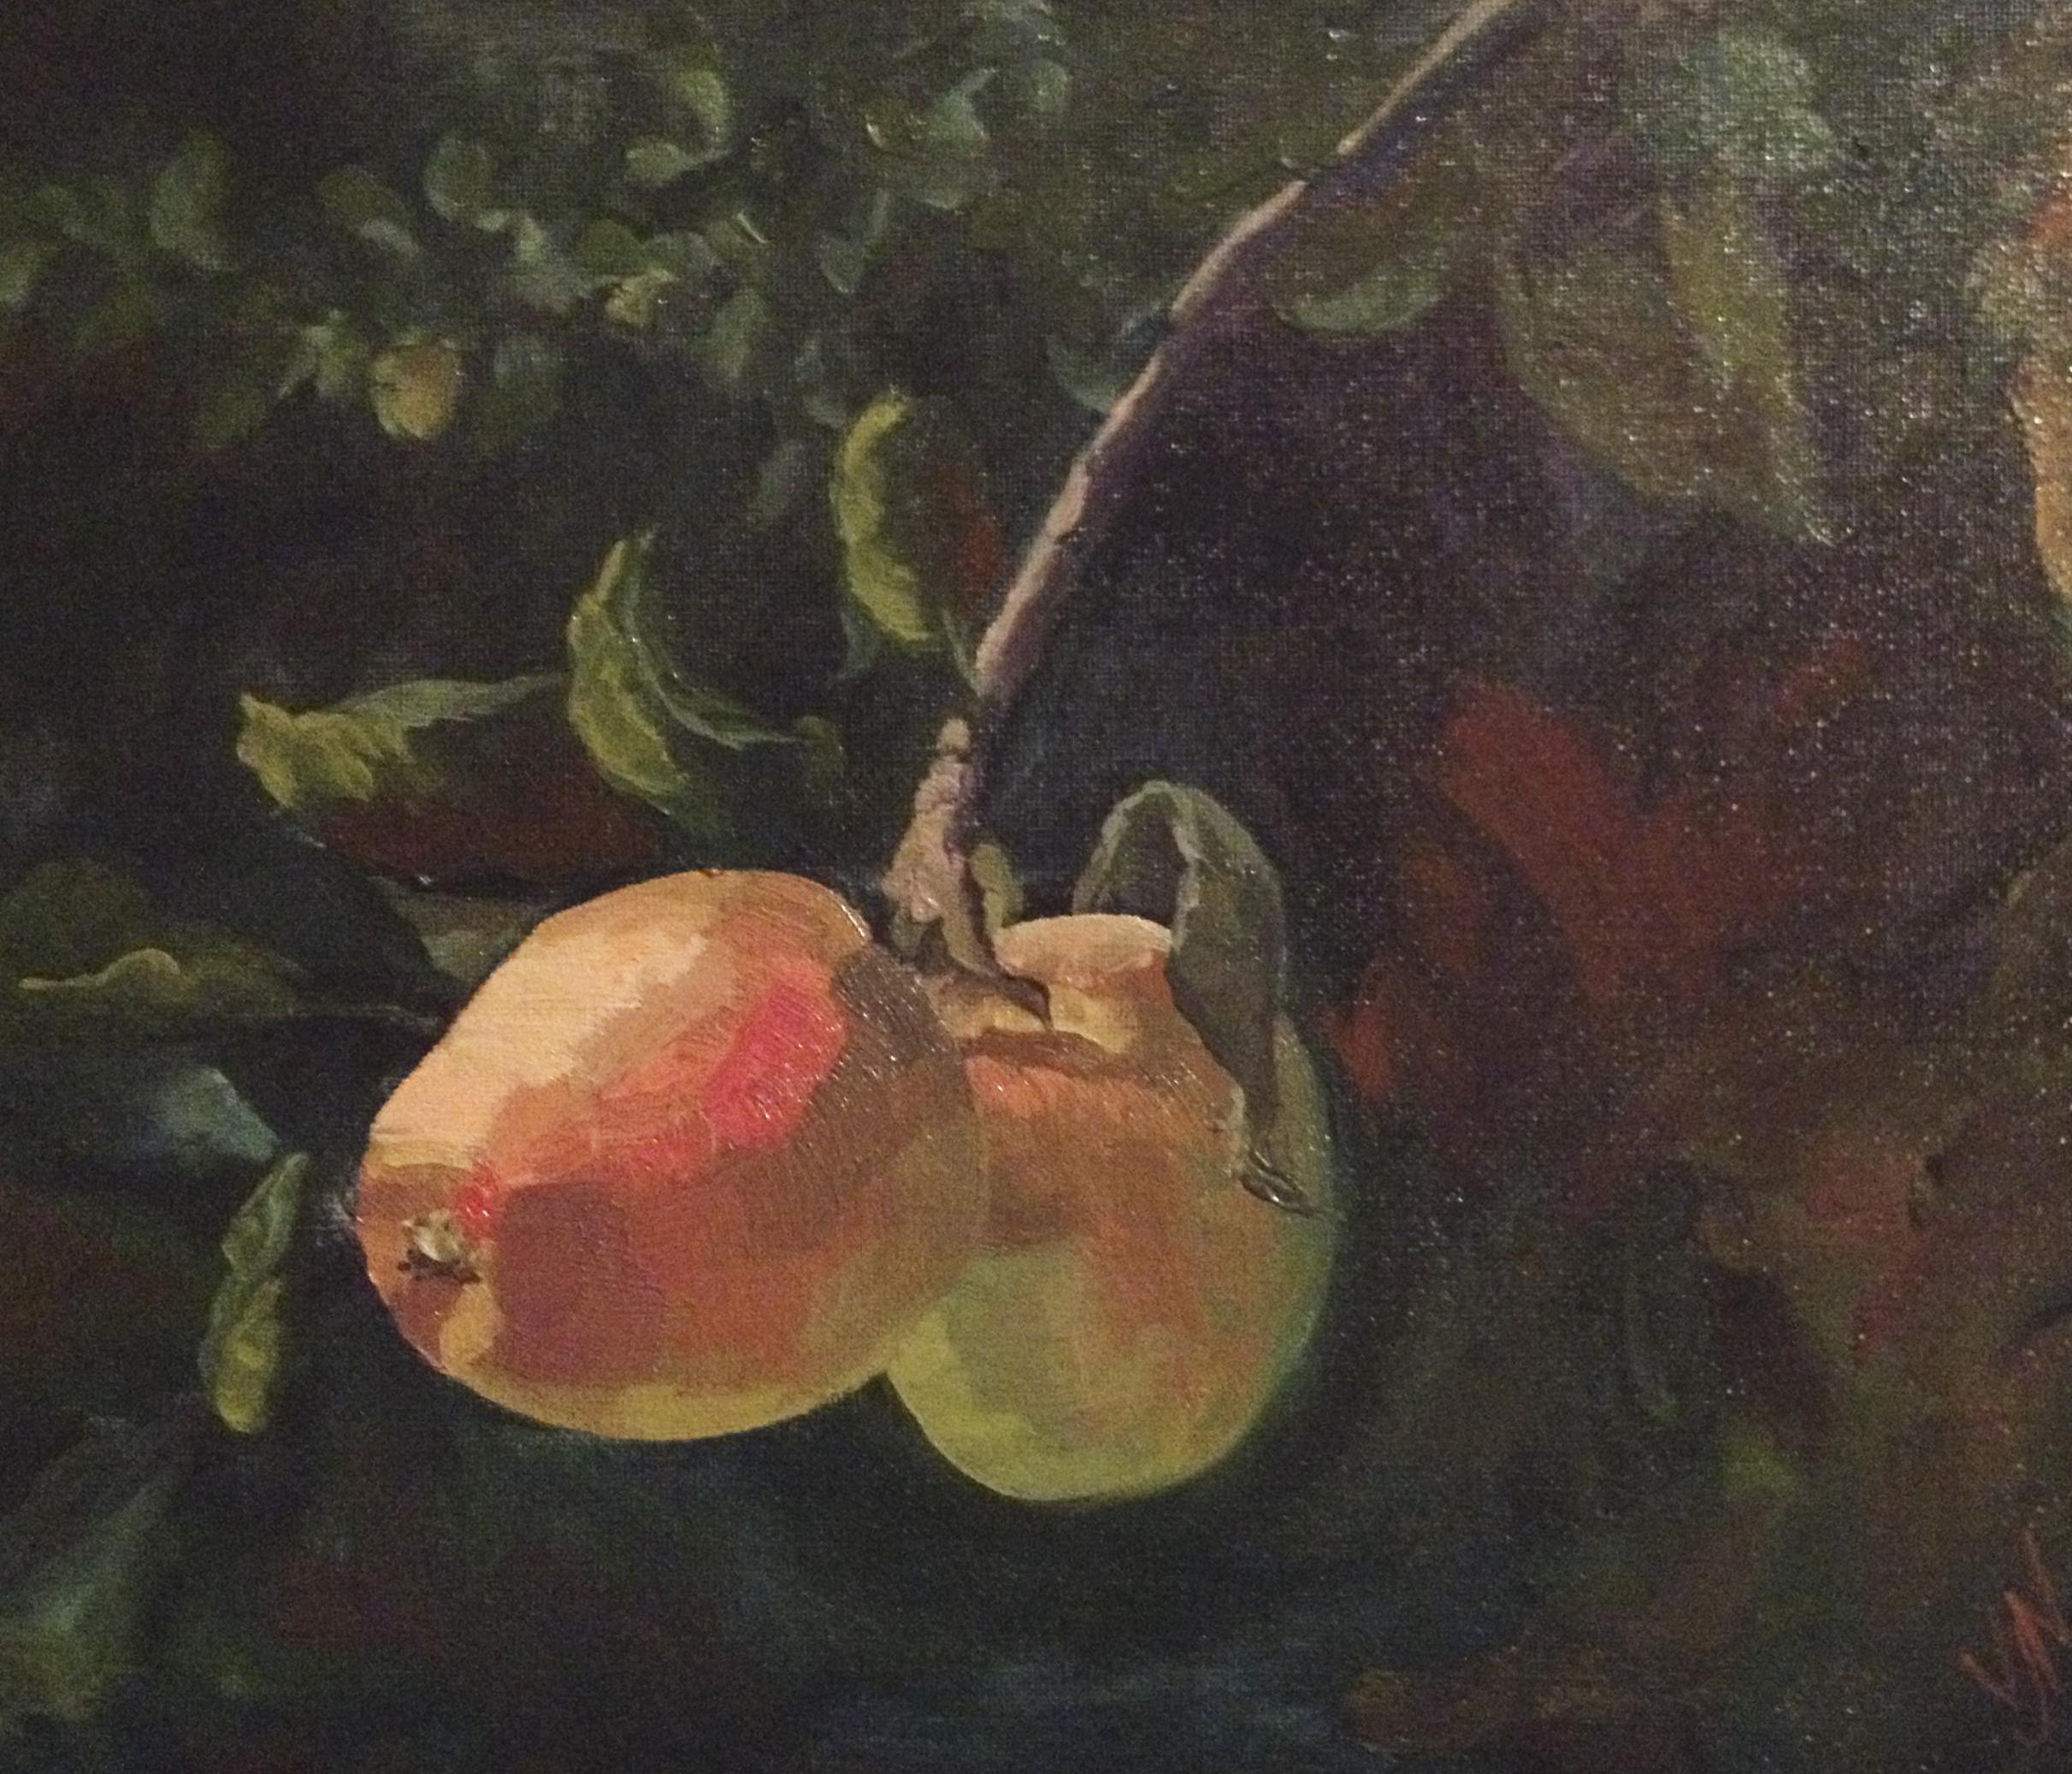 Miri's apples